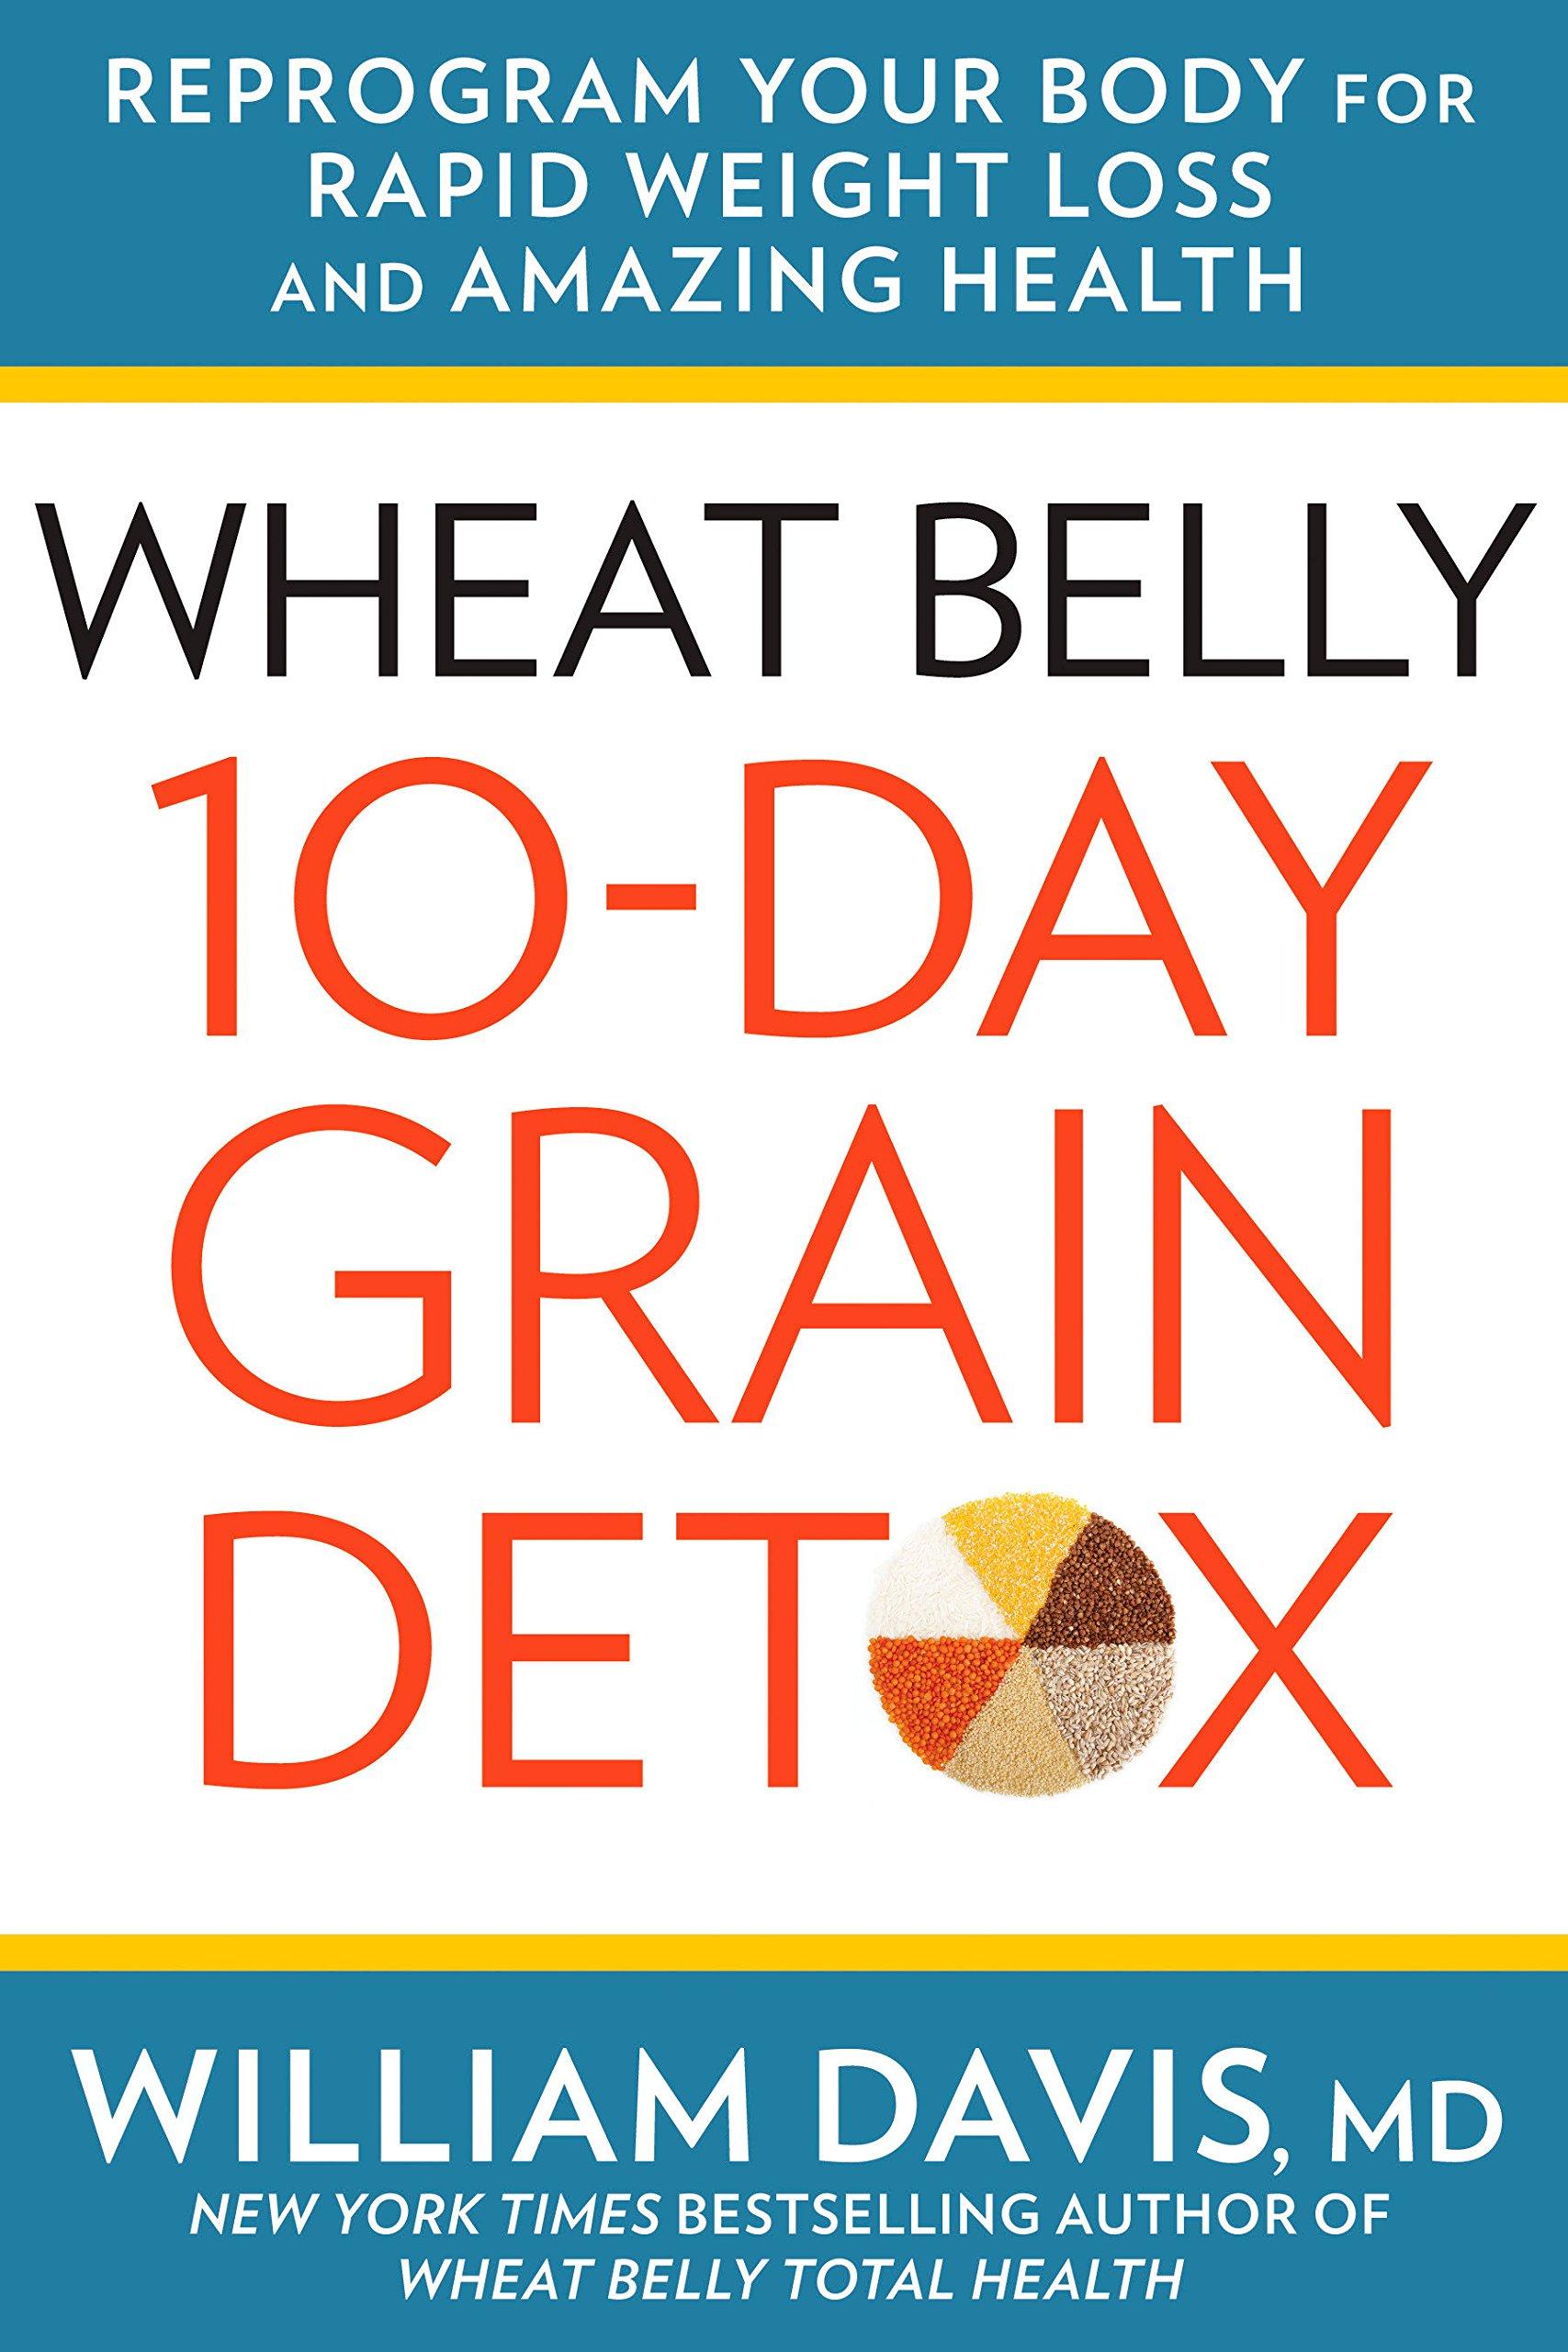 Wheat Belly 10-Day Grain Detox: Reprogram Your Body for ...